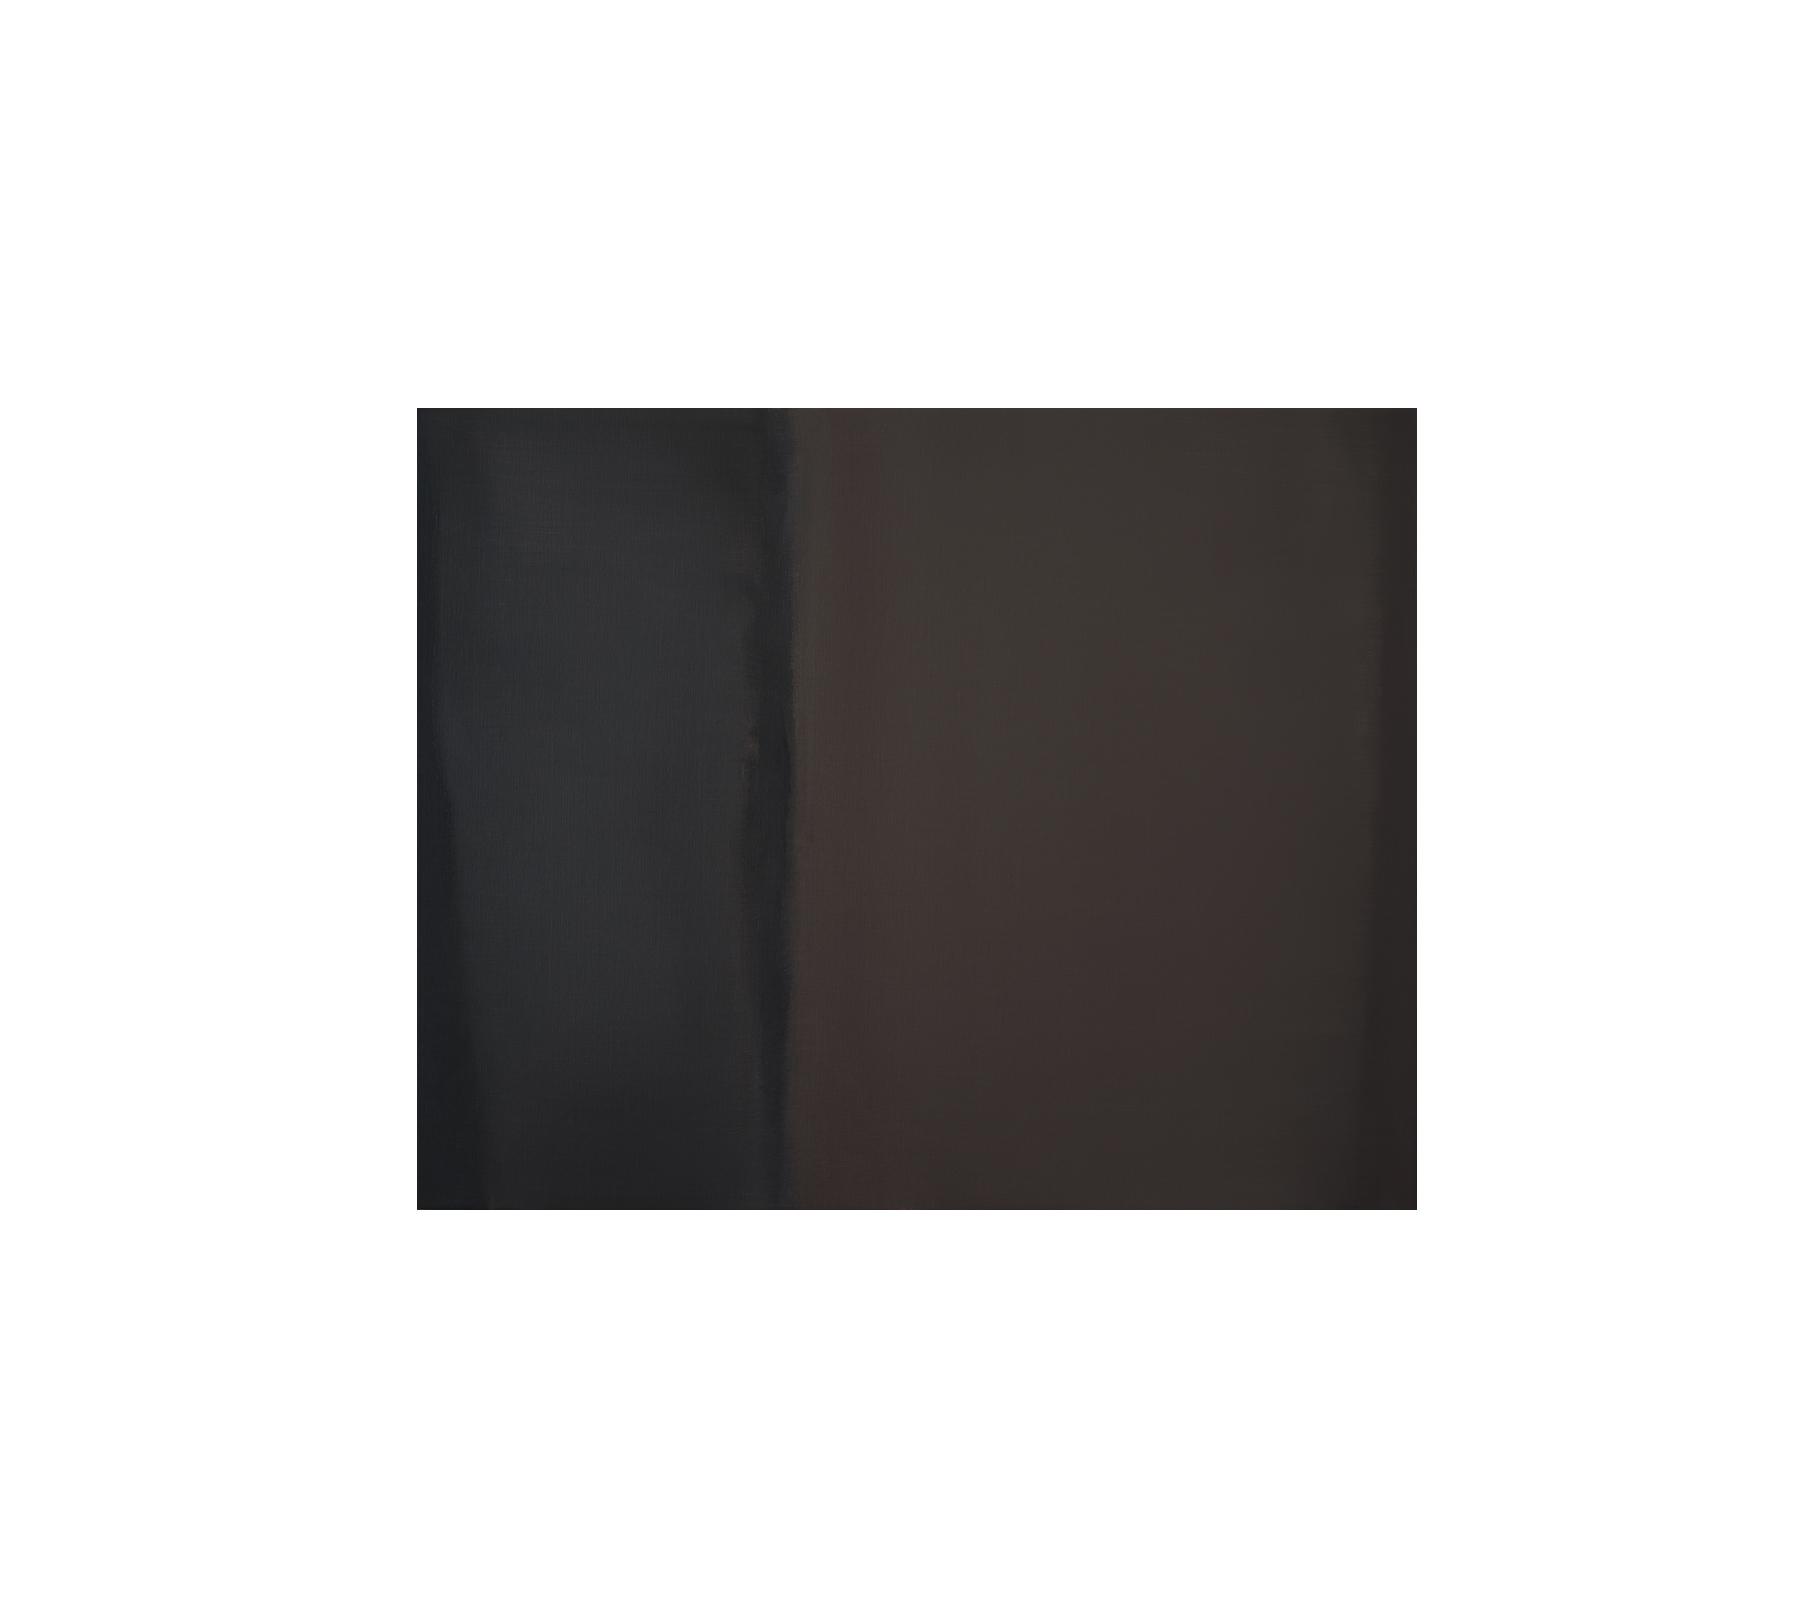 Untitled 2017 90x100cm